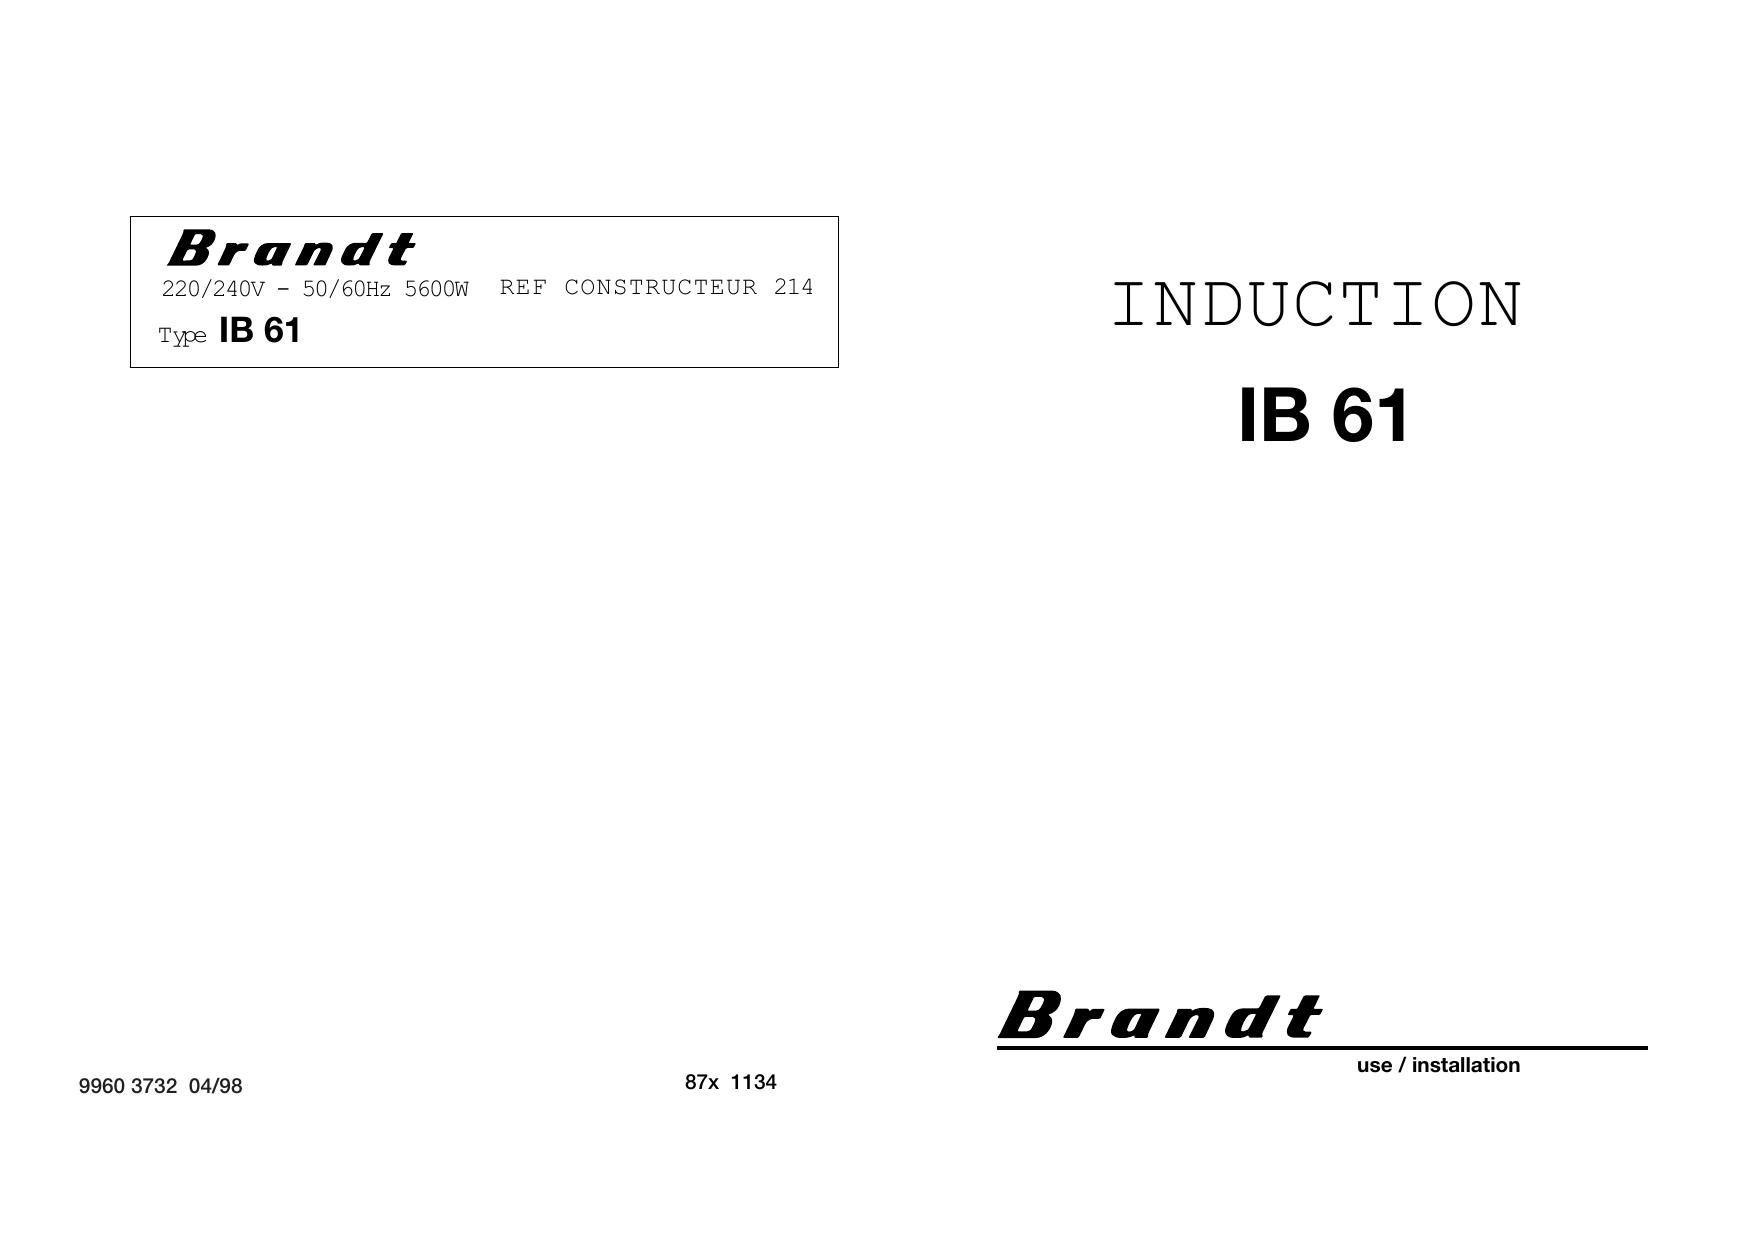 IB61 - Kleenmaid | manualzz.com Kleenmaid Washing Machine Wiring Diagram on